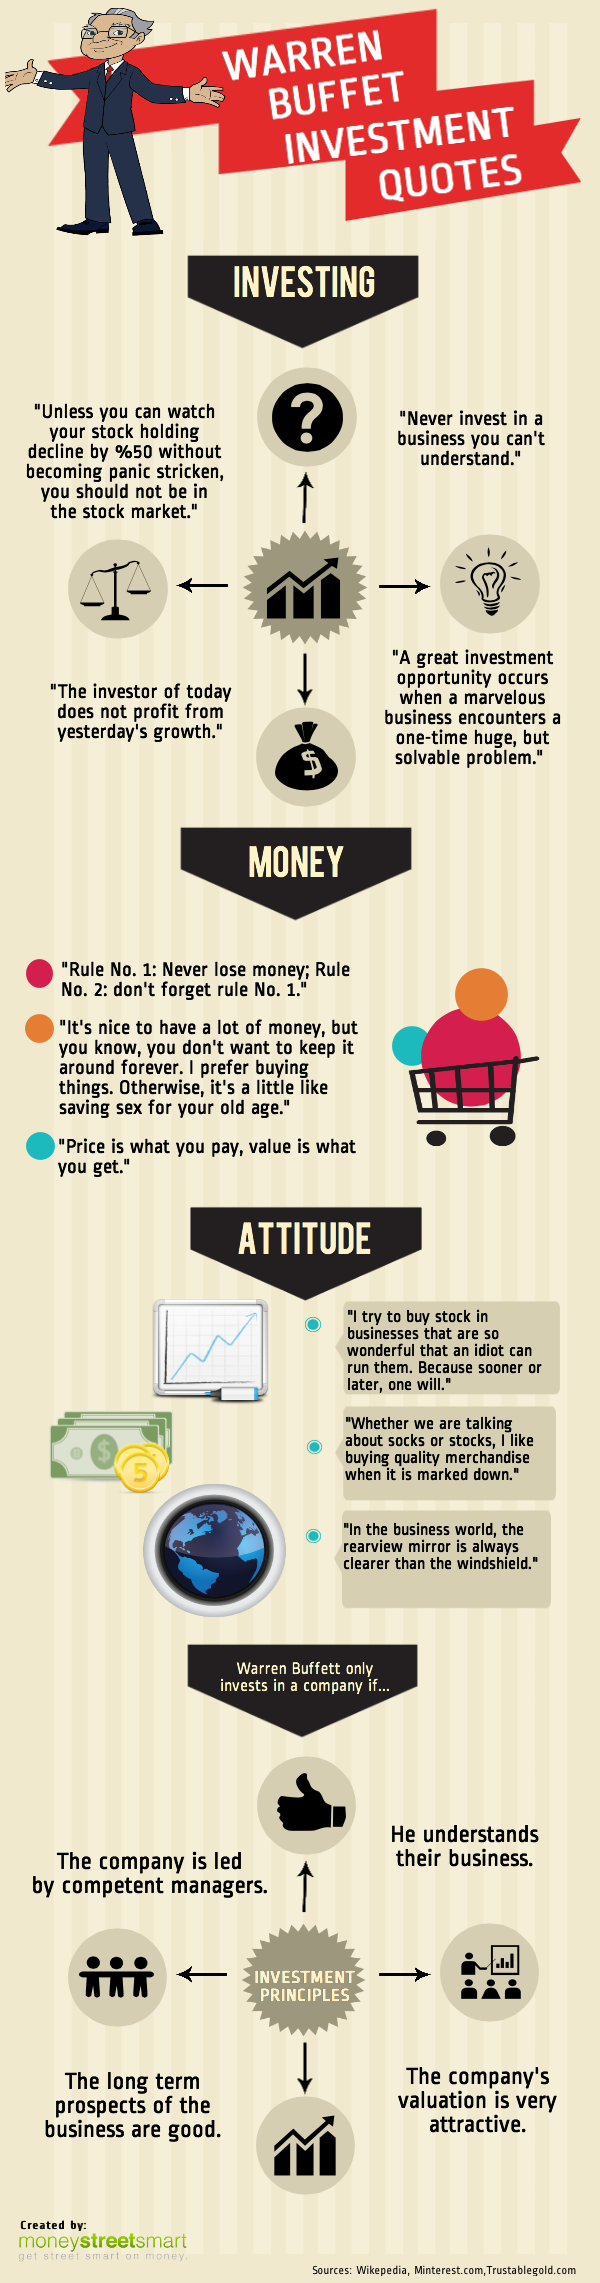 Investment quote #8